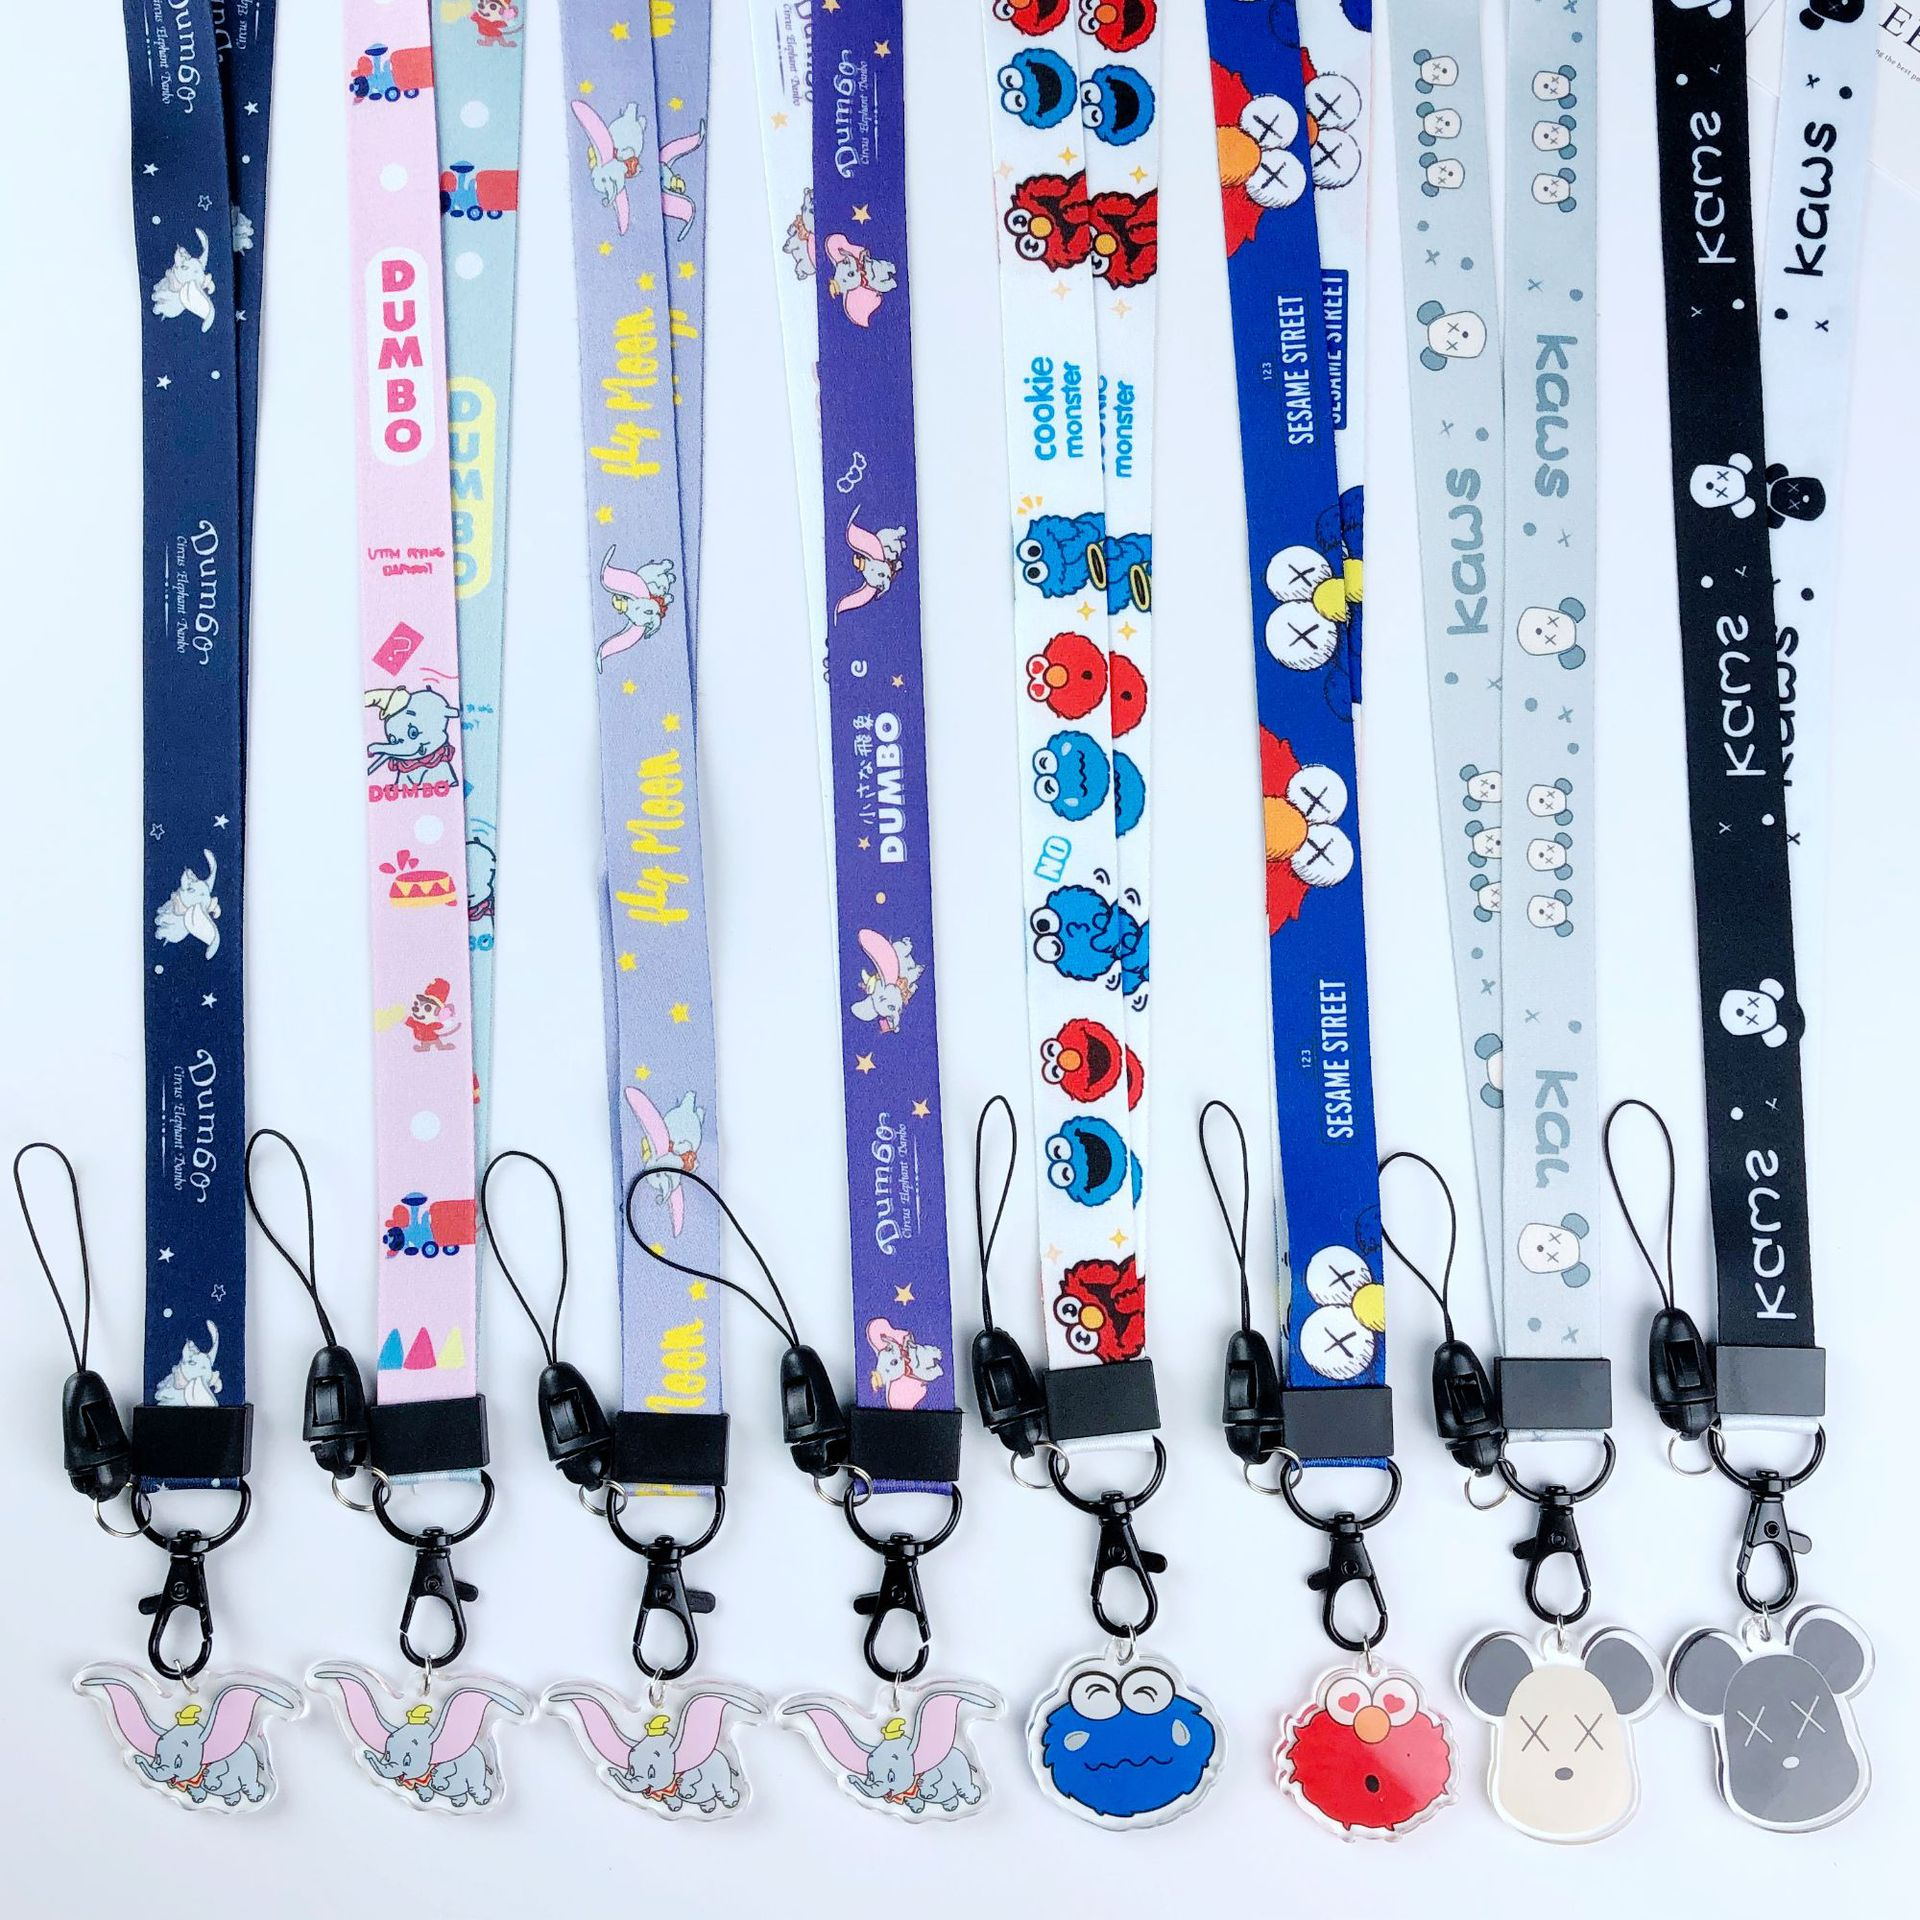 SuperSenter Premium Lanyard Goofy Cartoon Themed Hook /& Phone String Keychains or ID Badge Holders